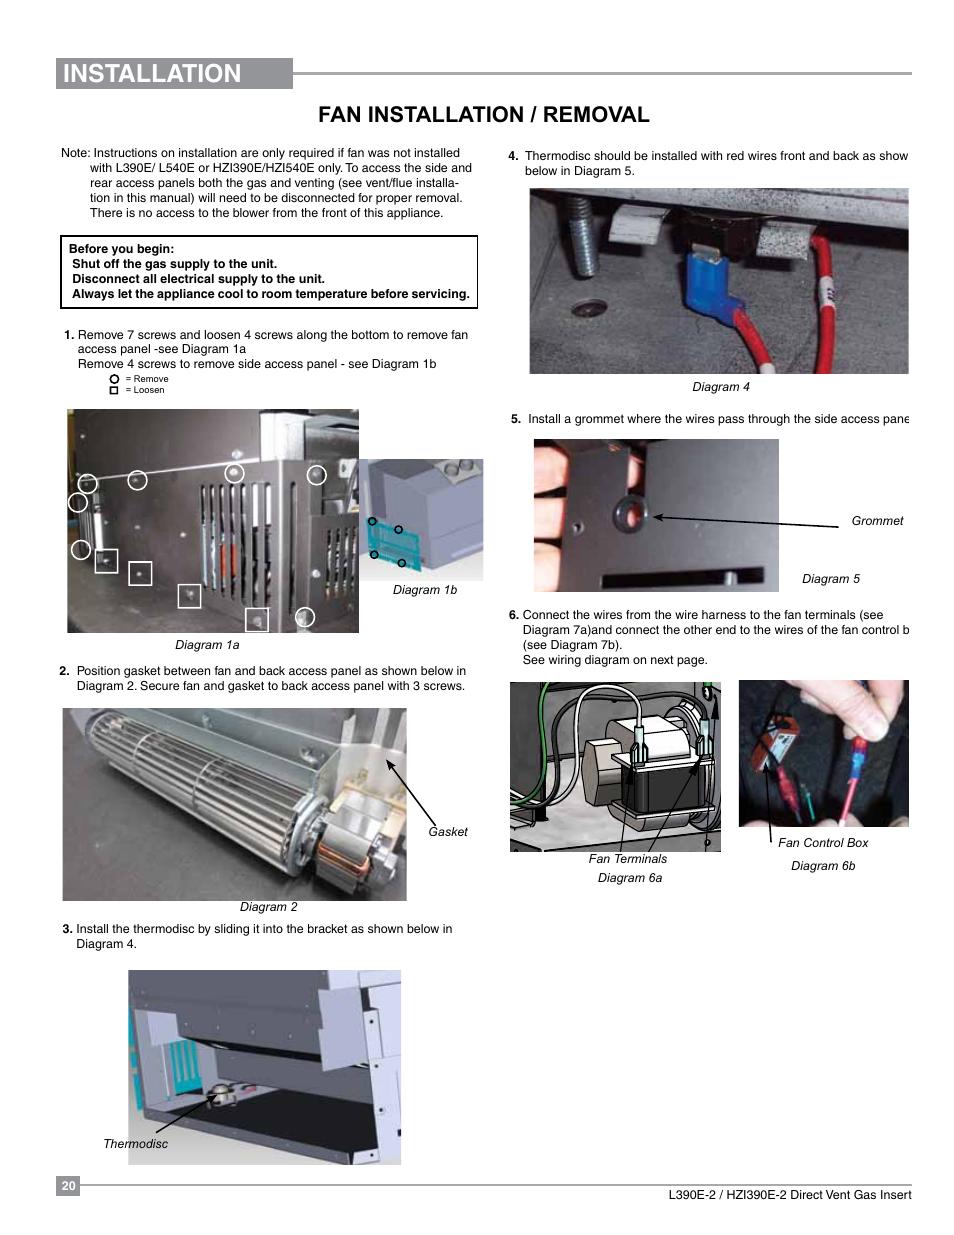 Installation Fan Removal Regency Liberty L390eb Access Wiring Diagram Medium Gas Insert User Manual Page 20 60